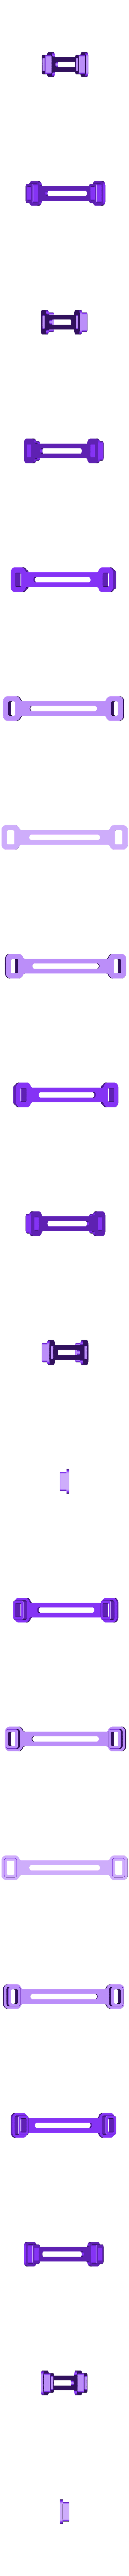 rampes scx24 entretoise pieds.STL Download STL file AXIAL SCX24 mini or micro crawler Bridge 100 mm • Object to 3D print, lulu3Dbuilder